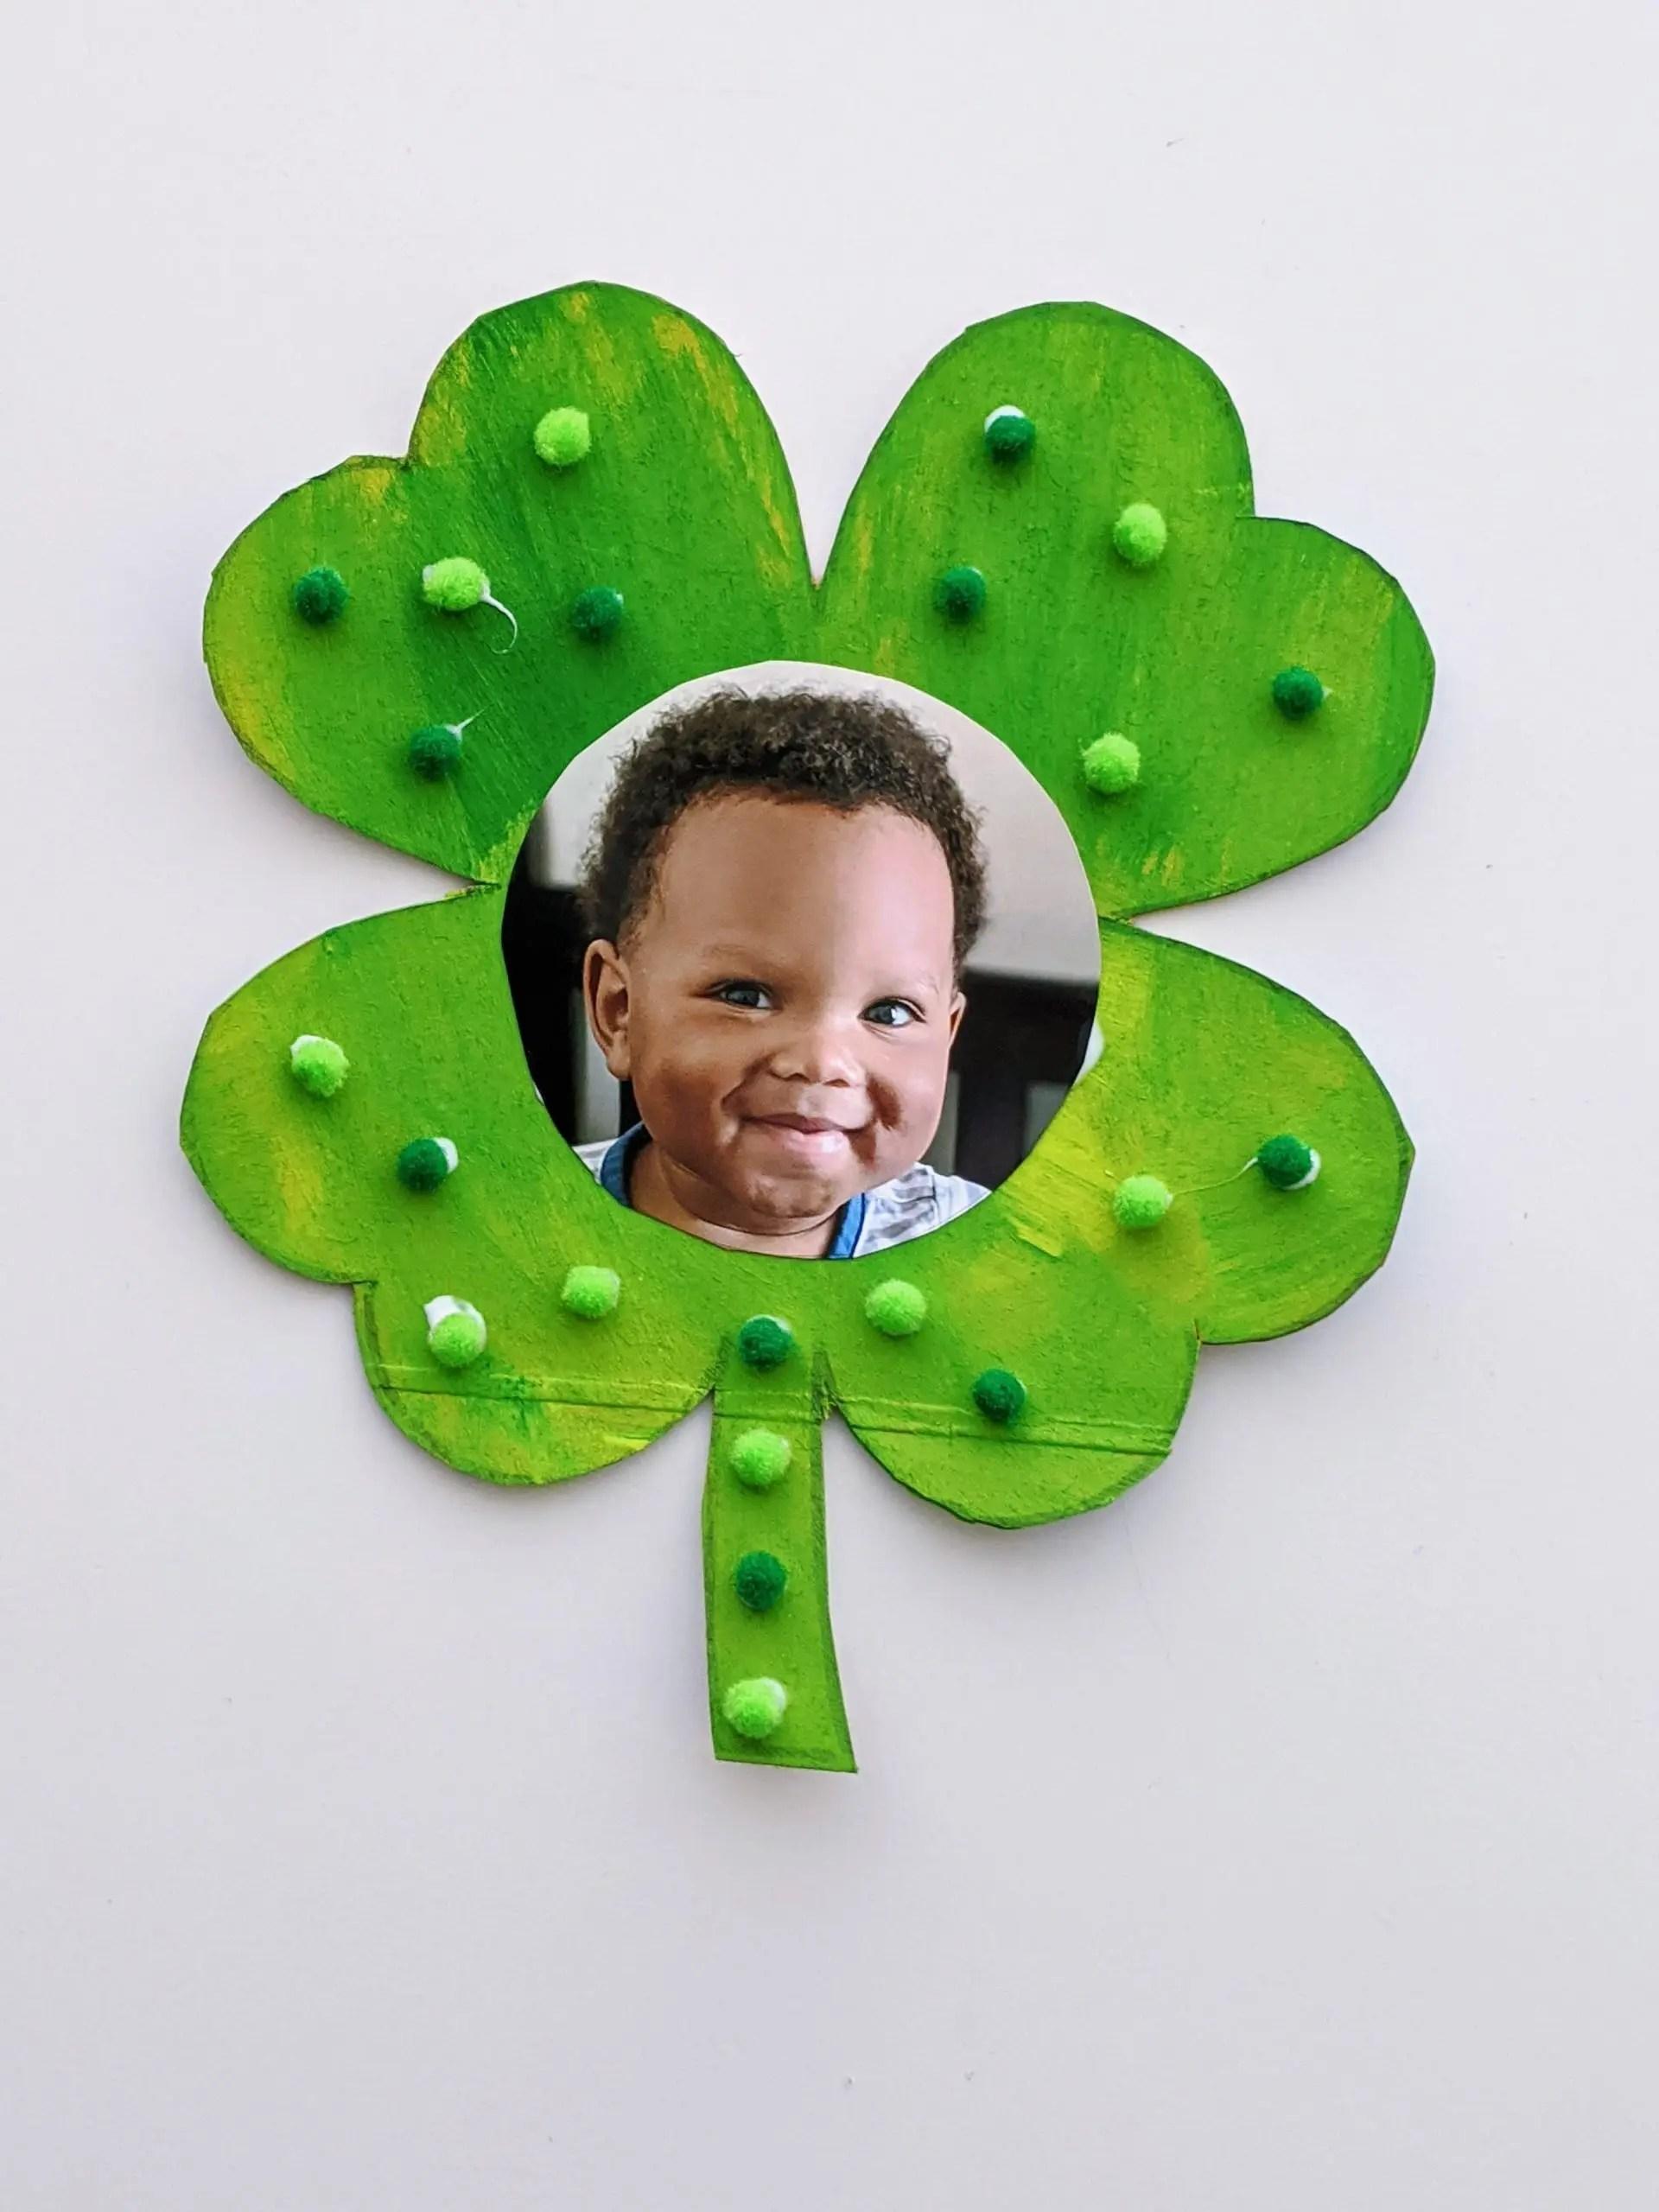 St. Patrick's Day crafts photo magnet